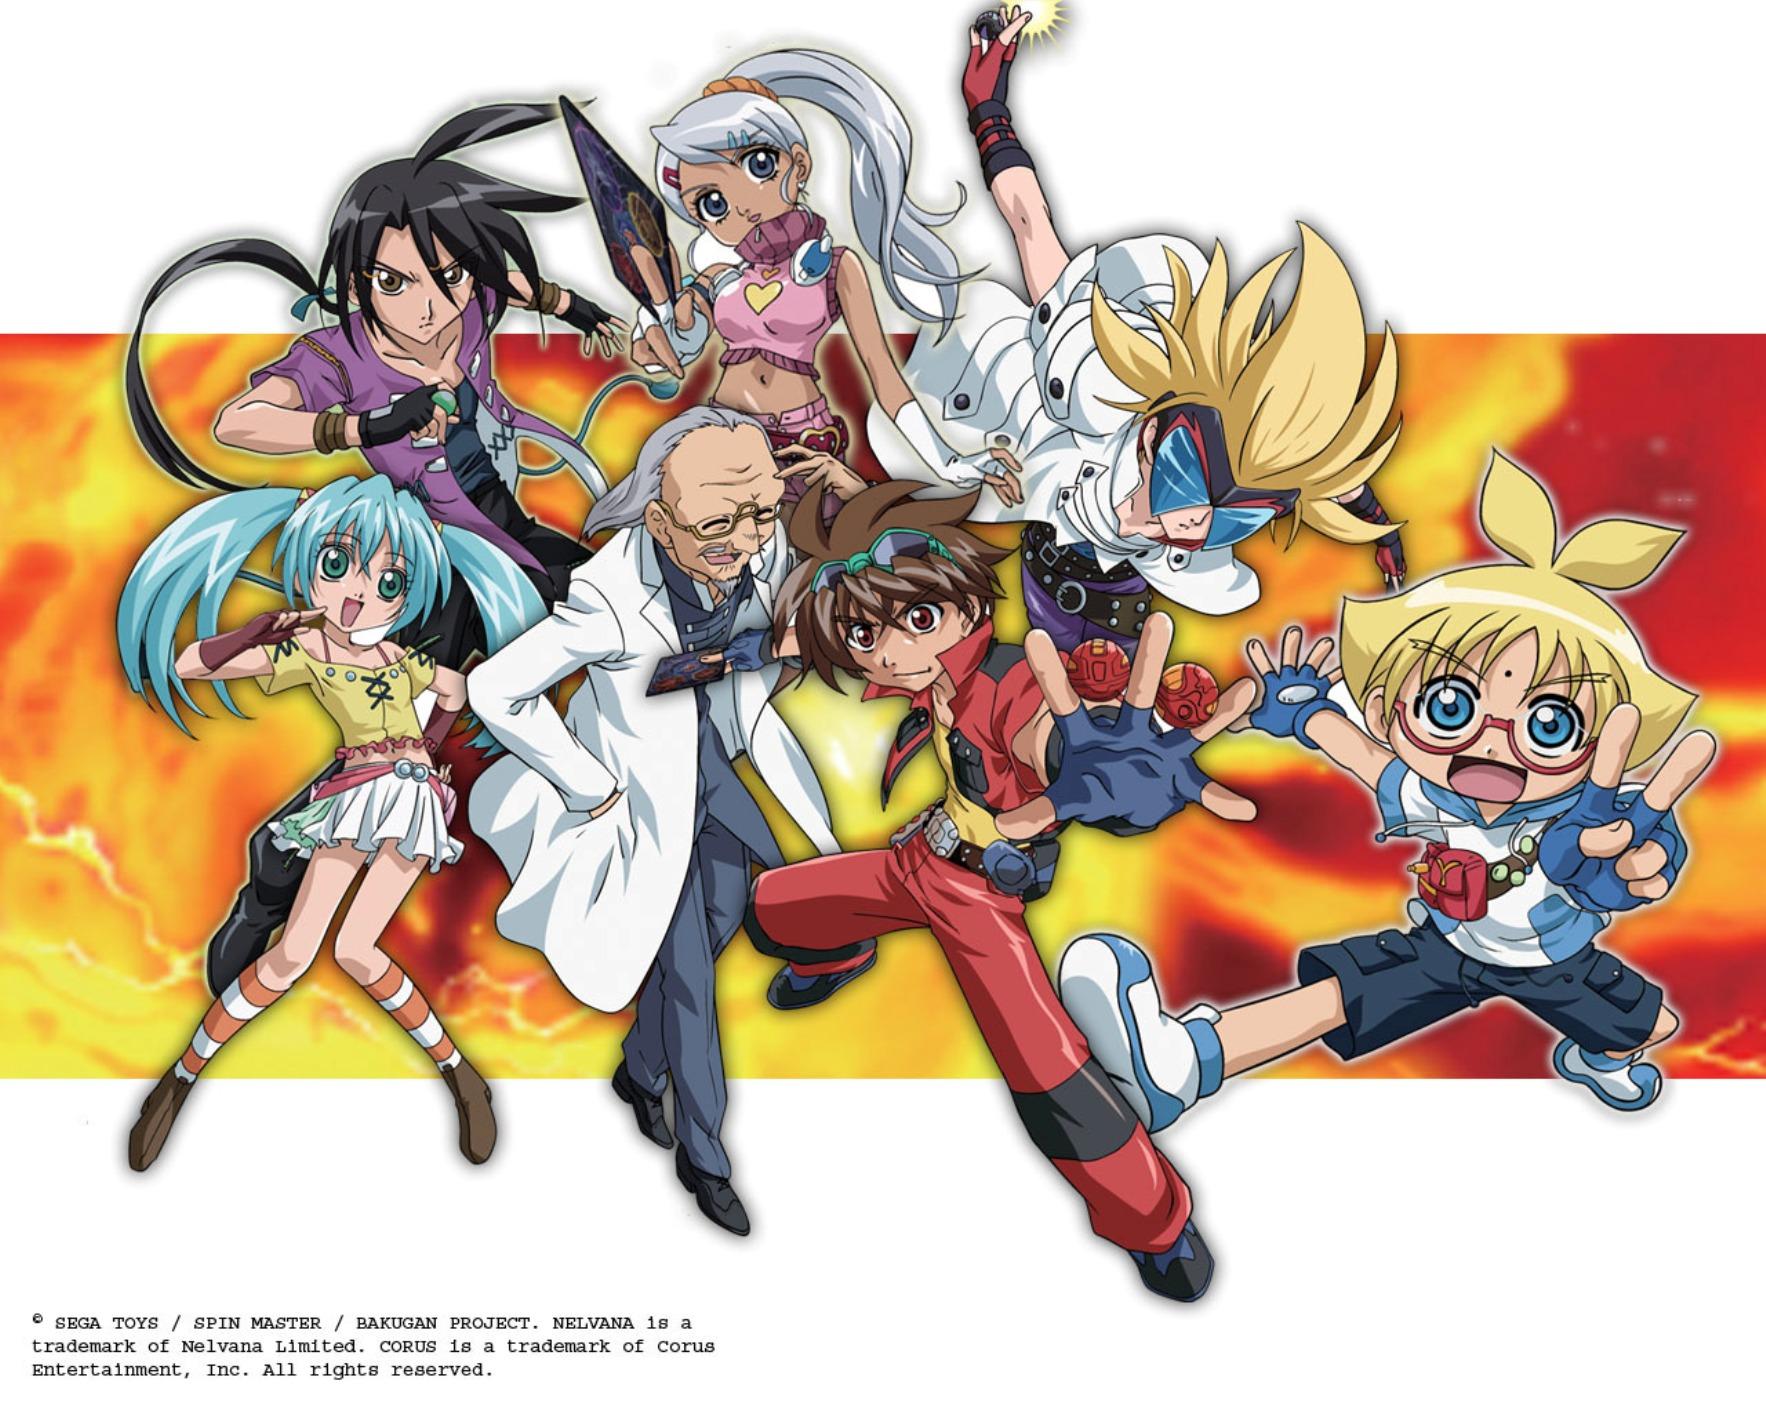 Bakugan battle brawlers image 878967 zerochan anime image board view fullsize bakugan battle brawlers image voltagebd Gallery